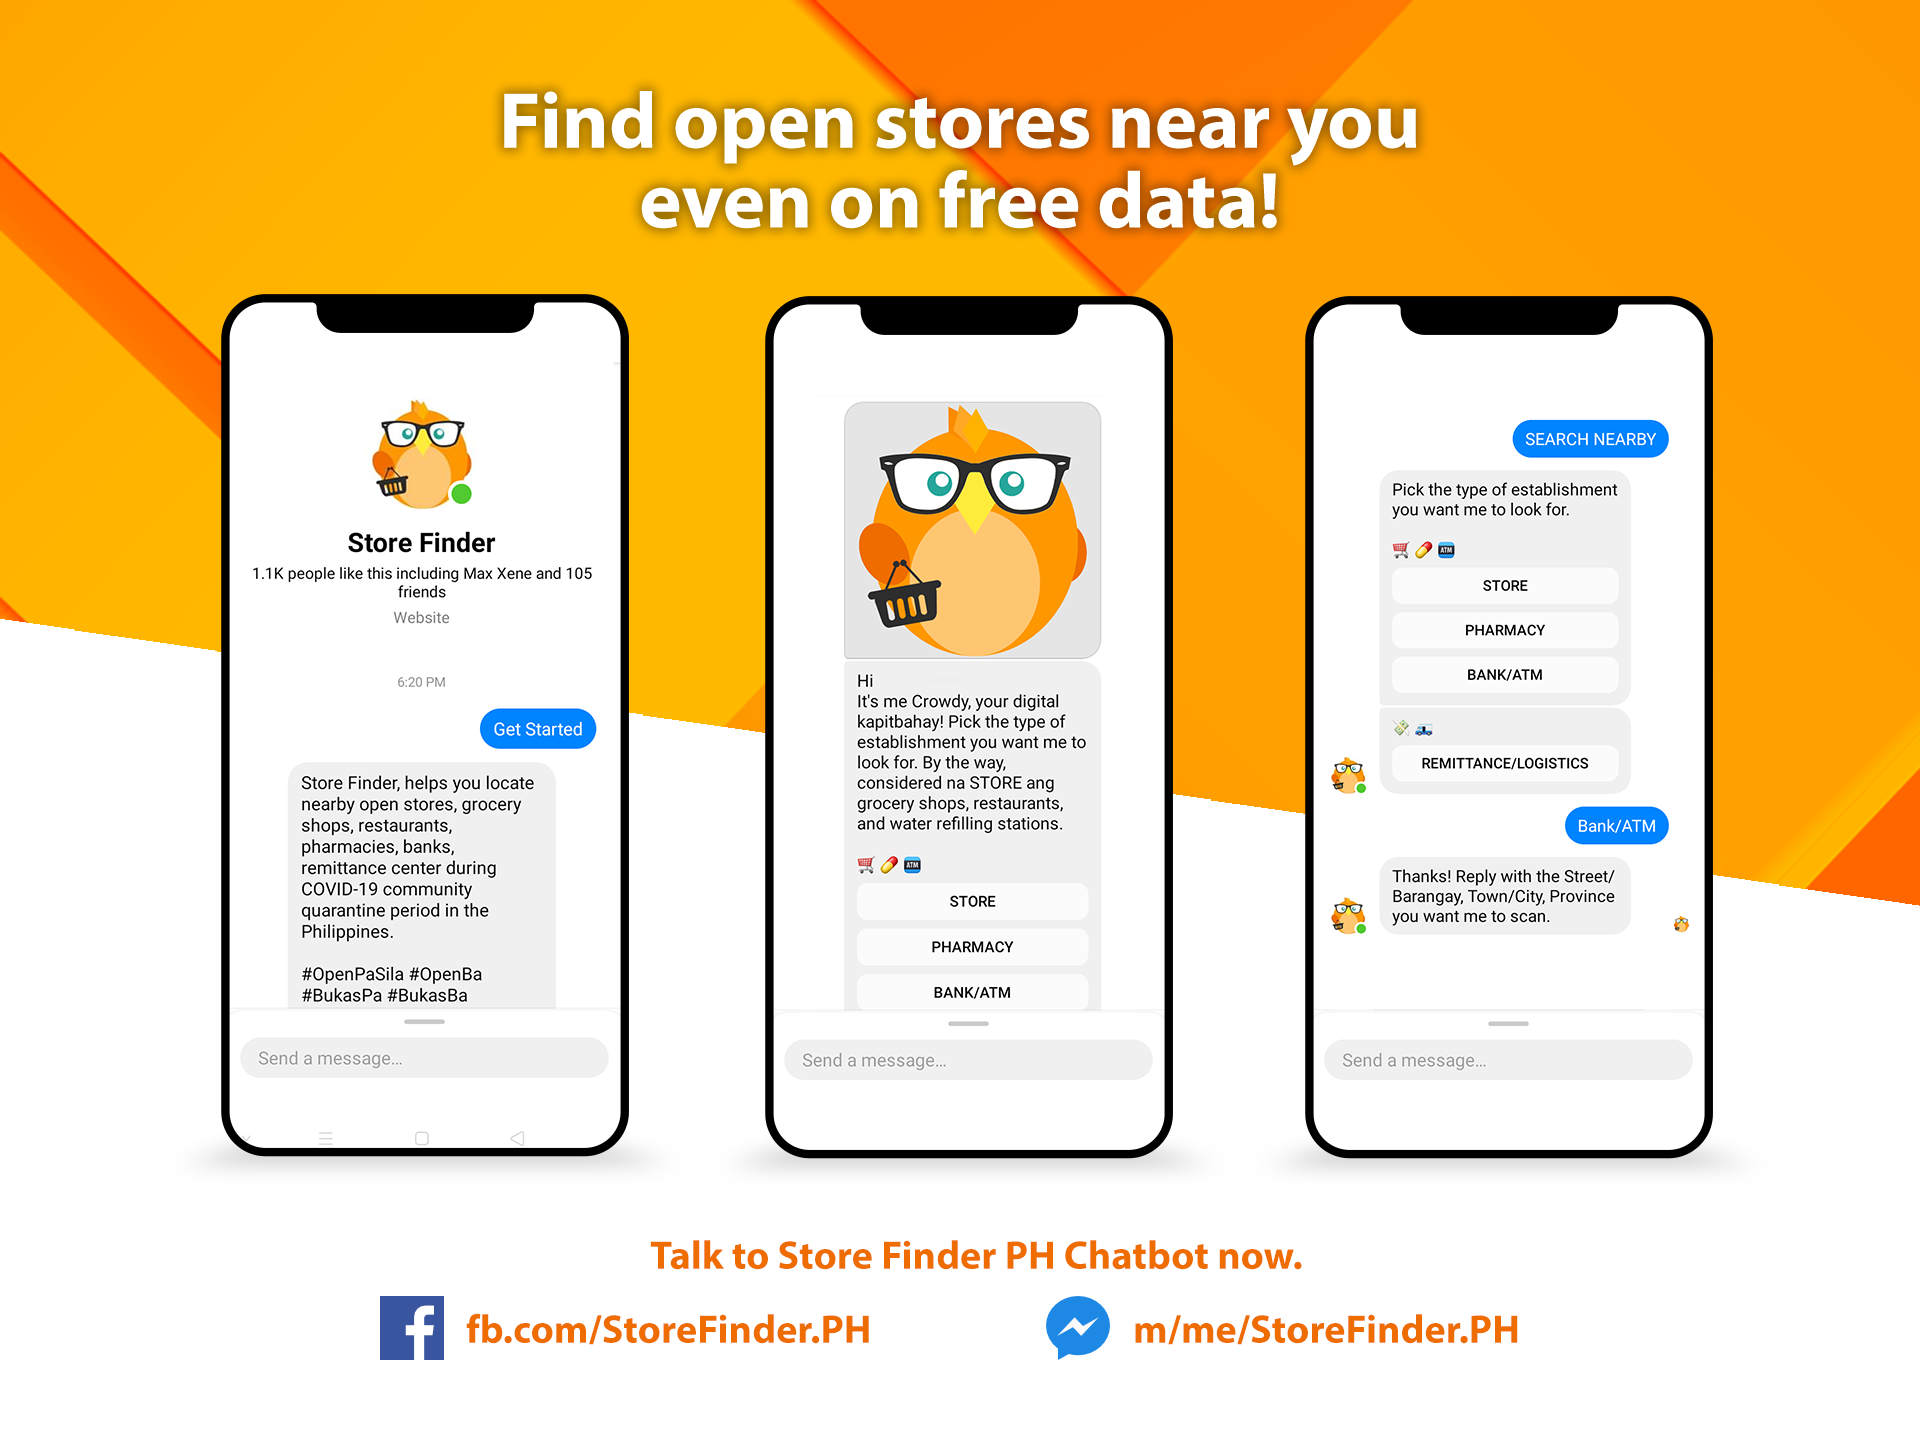 Store Finder PH Chatbot Photo